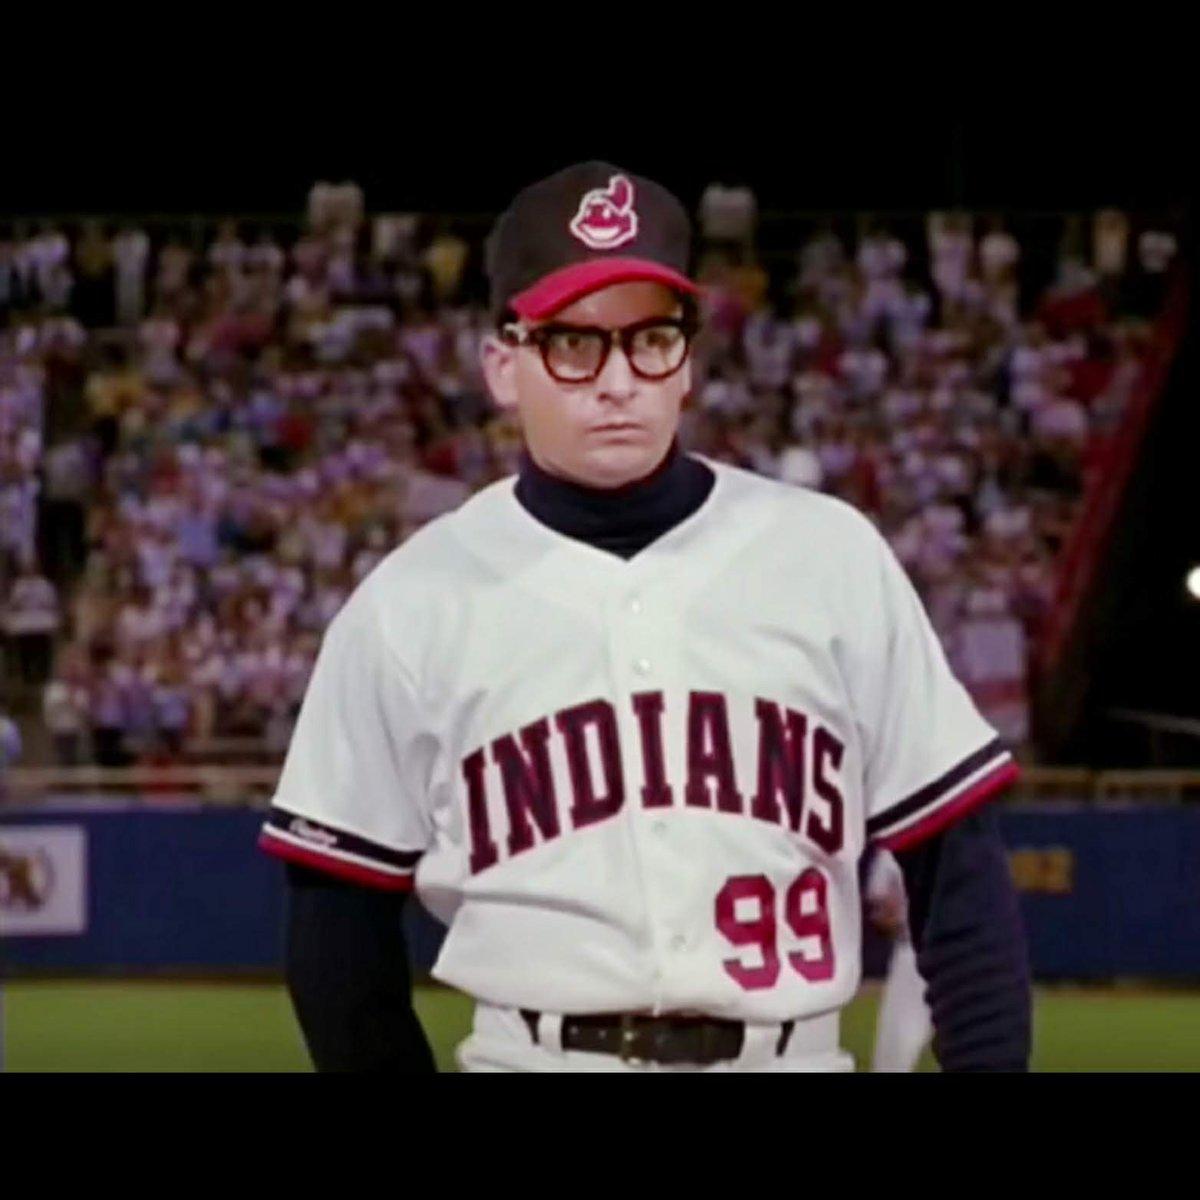 Major League 1989 @charliesheen @wesleysnipes @DennisHaysbert @corbinbernsen @MLB @IMDb #CharlieSheen #TomBerenger #ReneRusso #WesleySnipes #DennisHaysbert #NeilFlynn #DavidSWard #MajorLeague #TopRatedMovies #WatchThisFilm<br>http://pic.twitter.com/6YbxIn1E8W